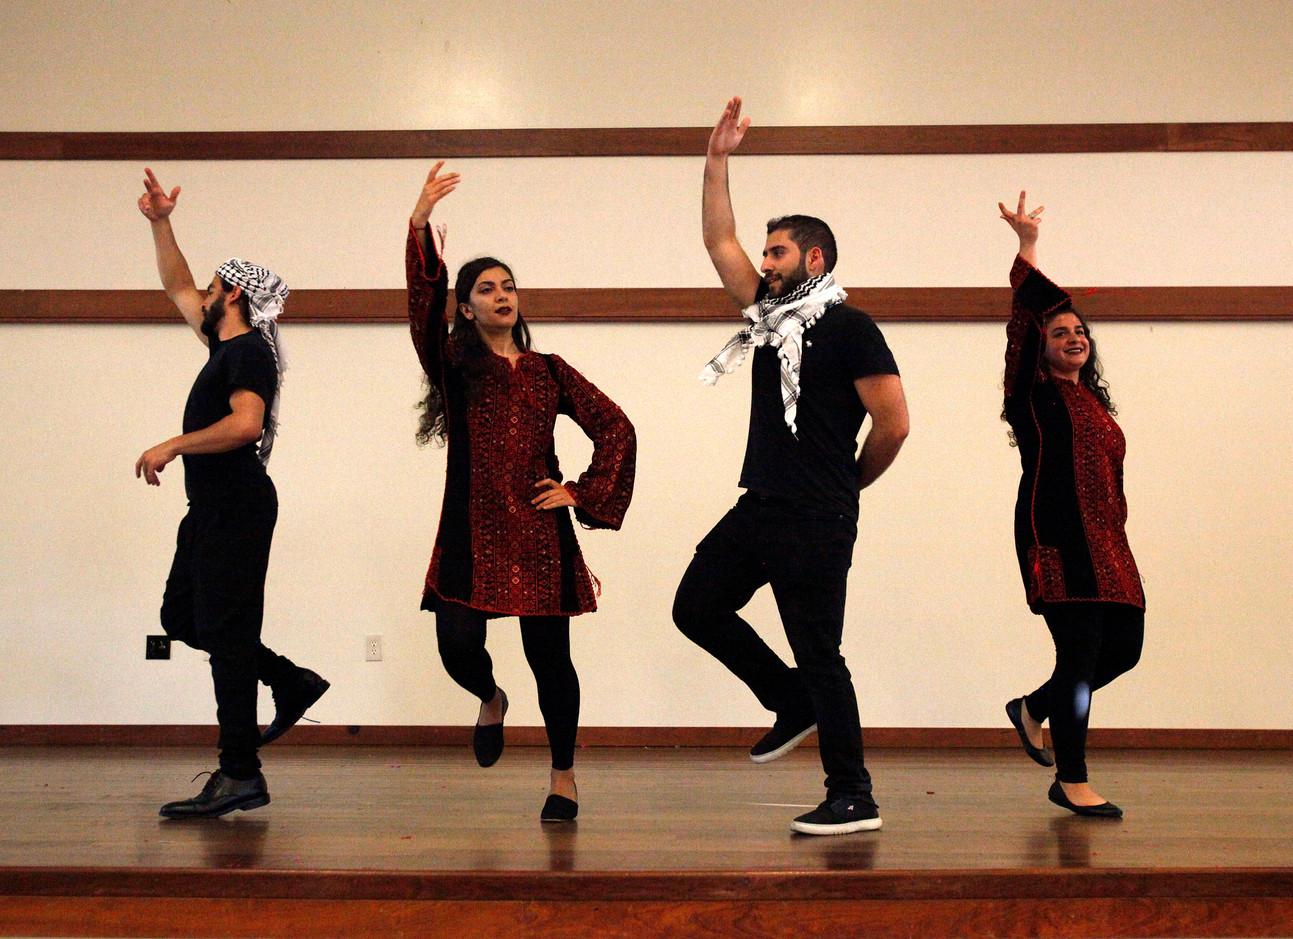 (left to right) Wassim Hage, Deellan Khanaka, Ahmad Merhebi, and Jana Kadah perform a traditional line dance from Levant called Dabke at World Refugee Day in Campbell, Santa Clara, on June 14.